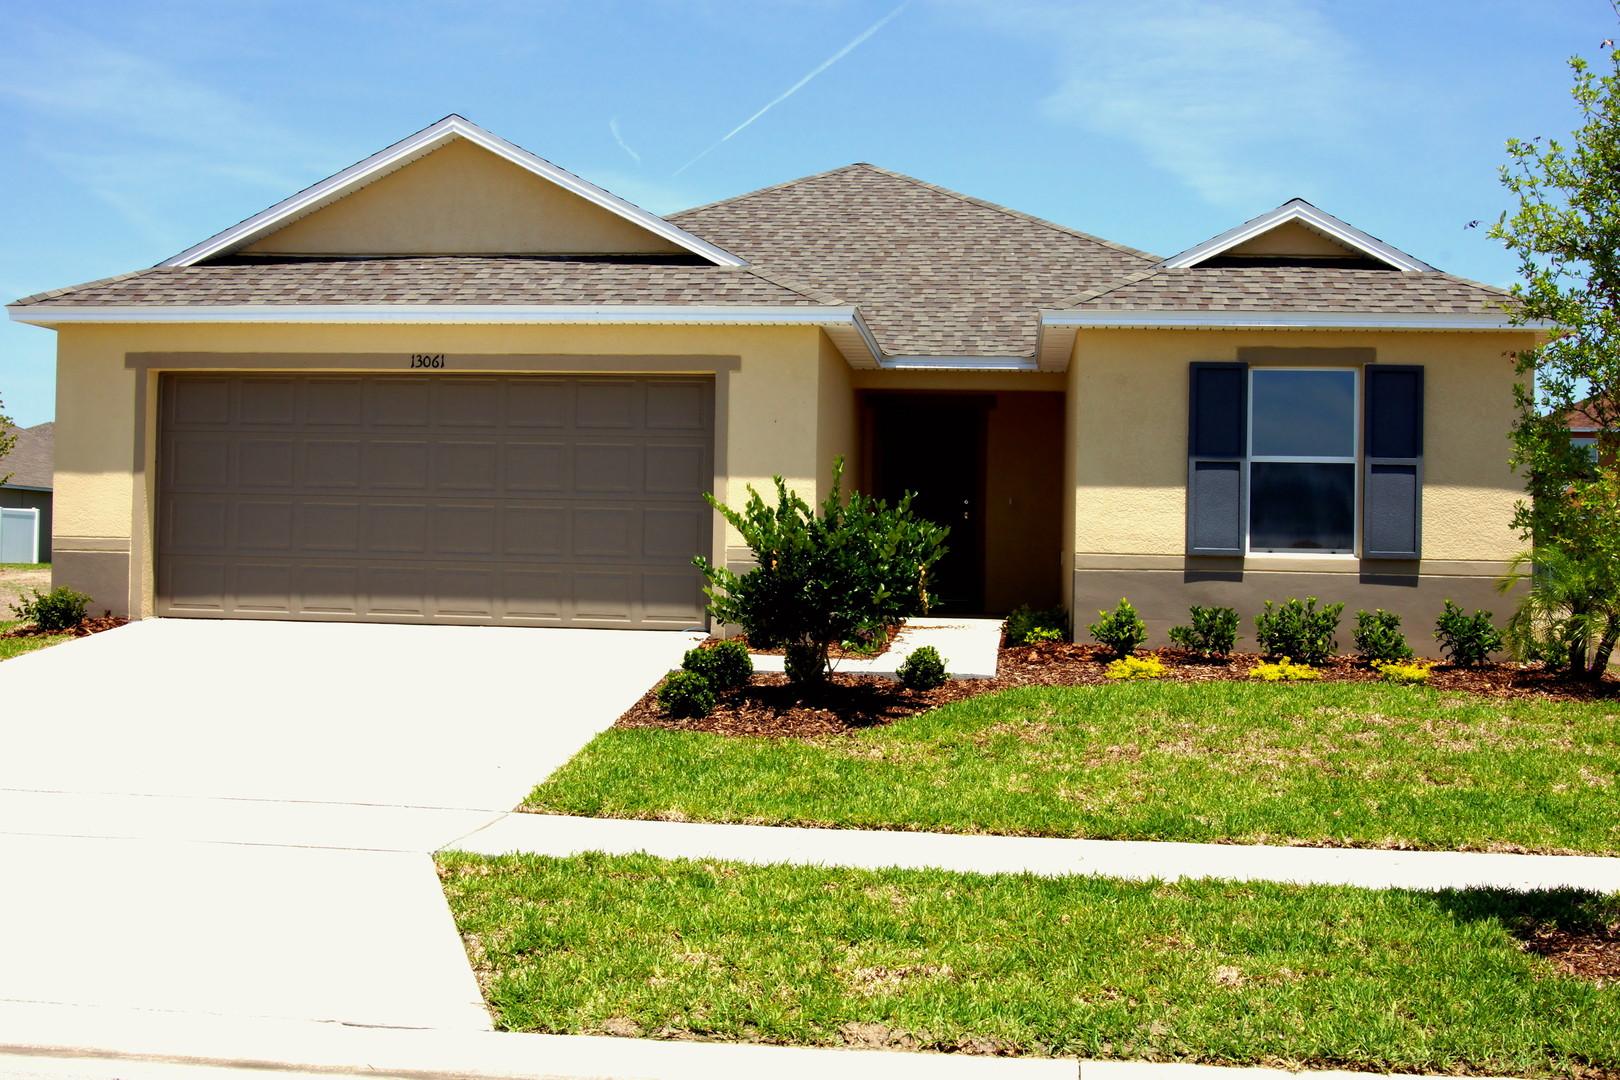 Cool 13061 Sawgrass Pine Circle Orlando Fl 32824 Rental Listing Download Free Architecture Designs Intelgarnamadebymaigaardcom